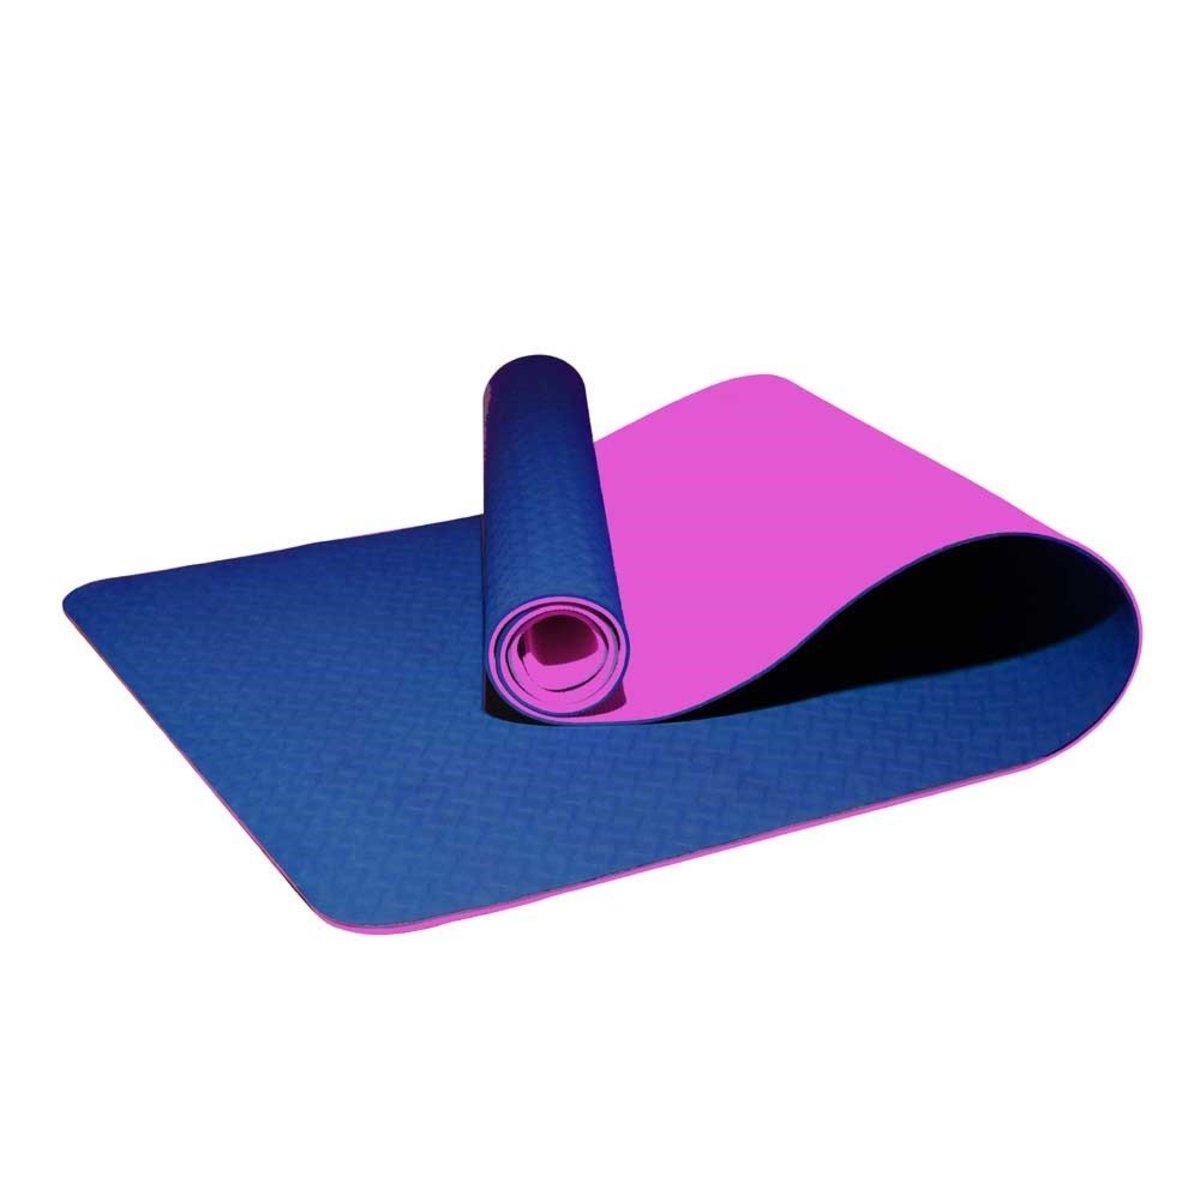 Tpe 2-Layer Yoga Mat 6mm Dark Blue/Purple